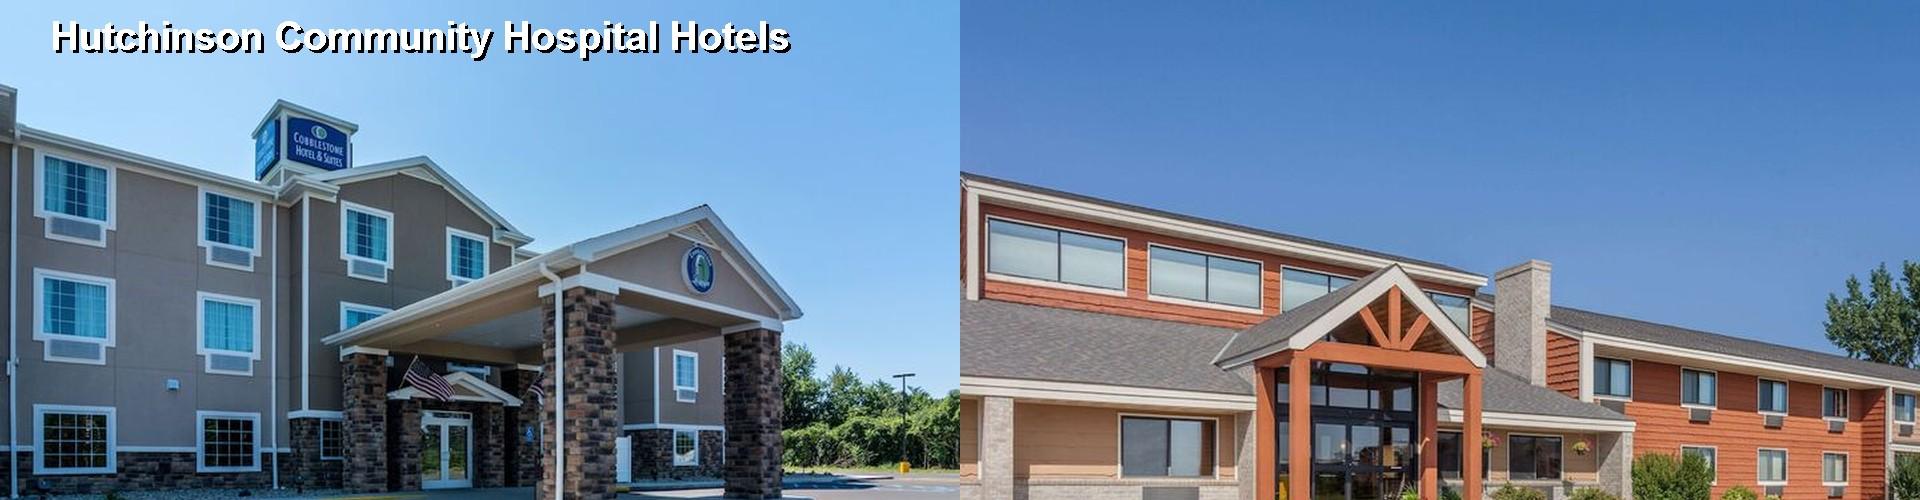 5 Best Hotels Near Hutchinson Community Hospital